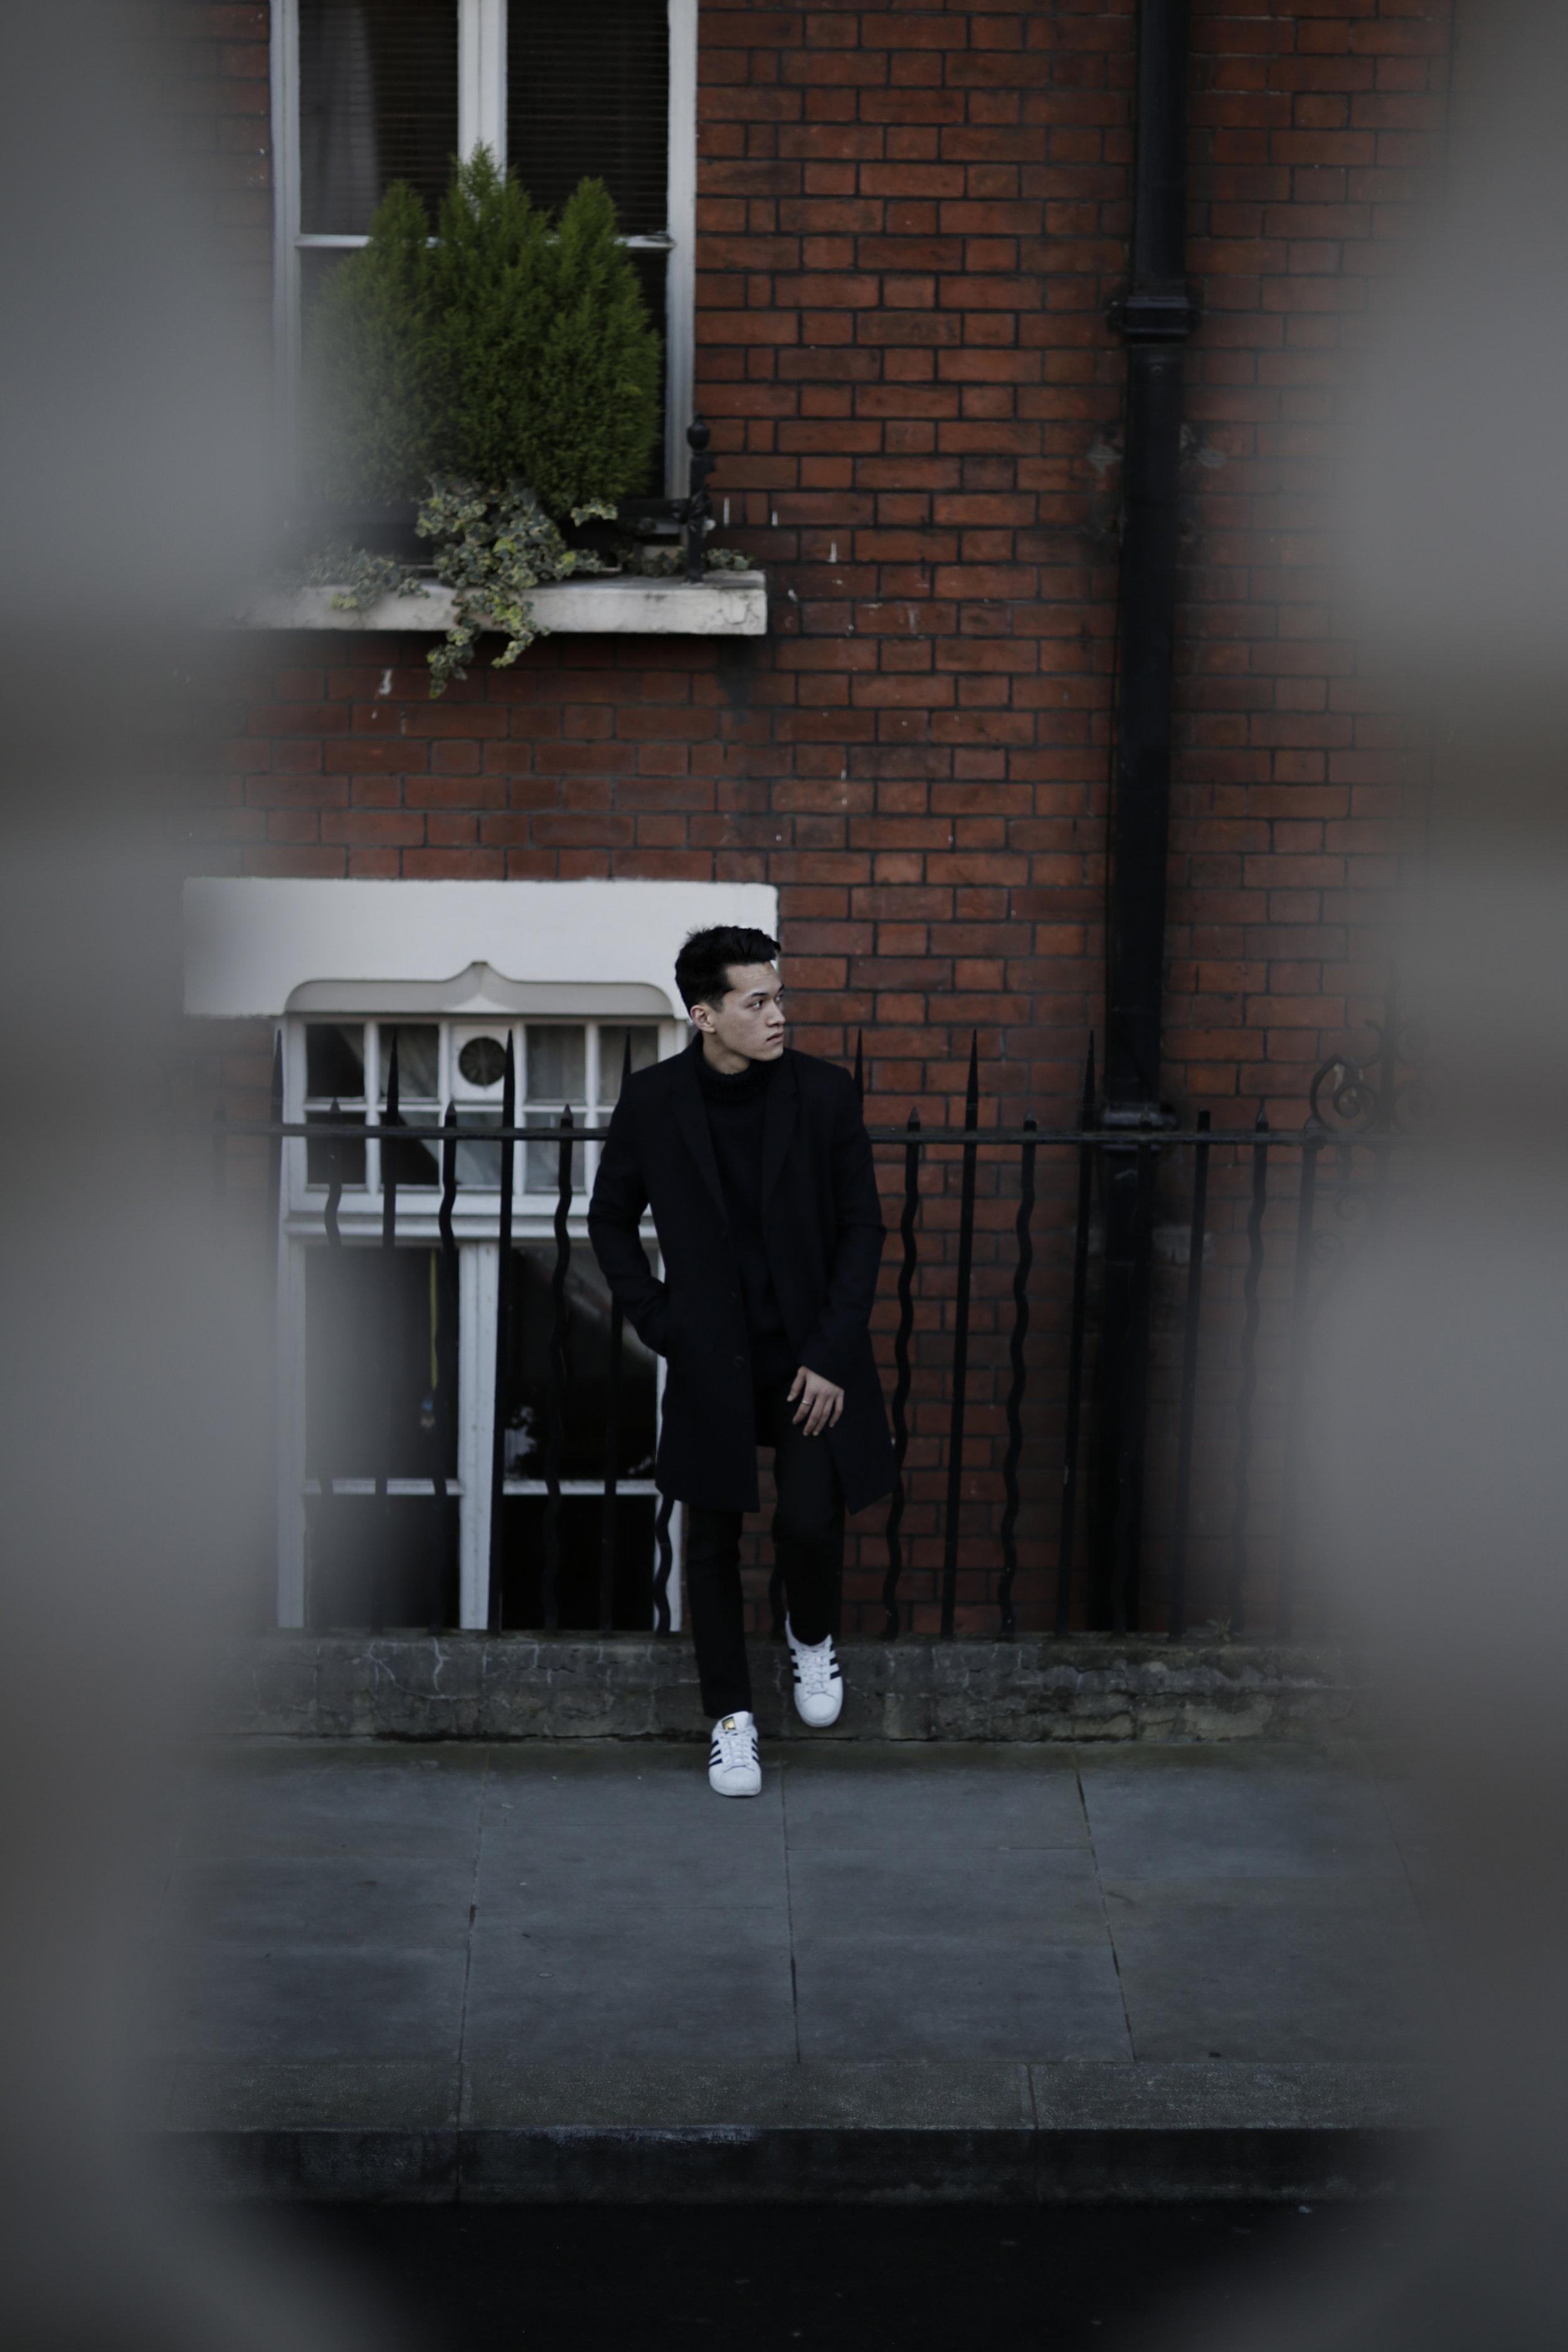 Jordan_Bunker_navy_london_strolls_9.jpg